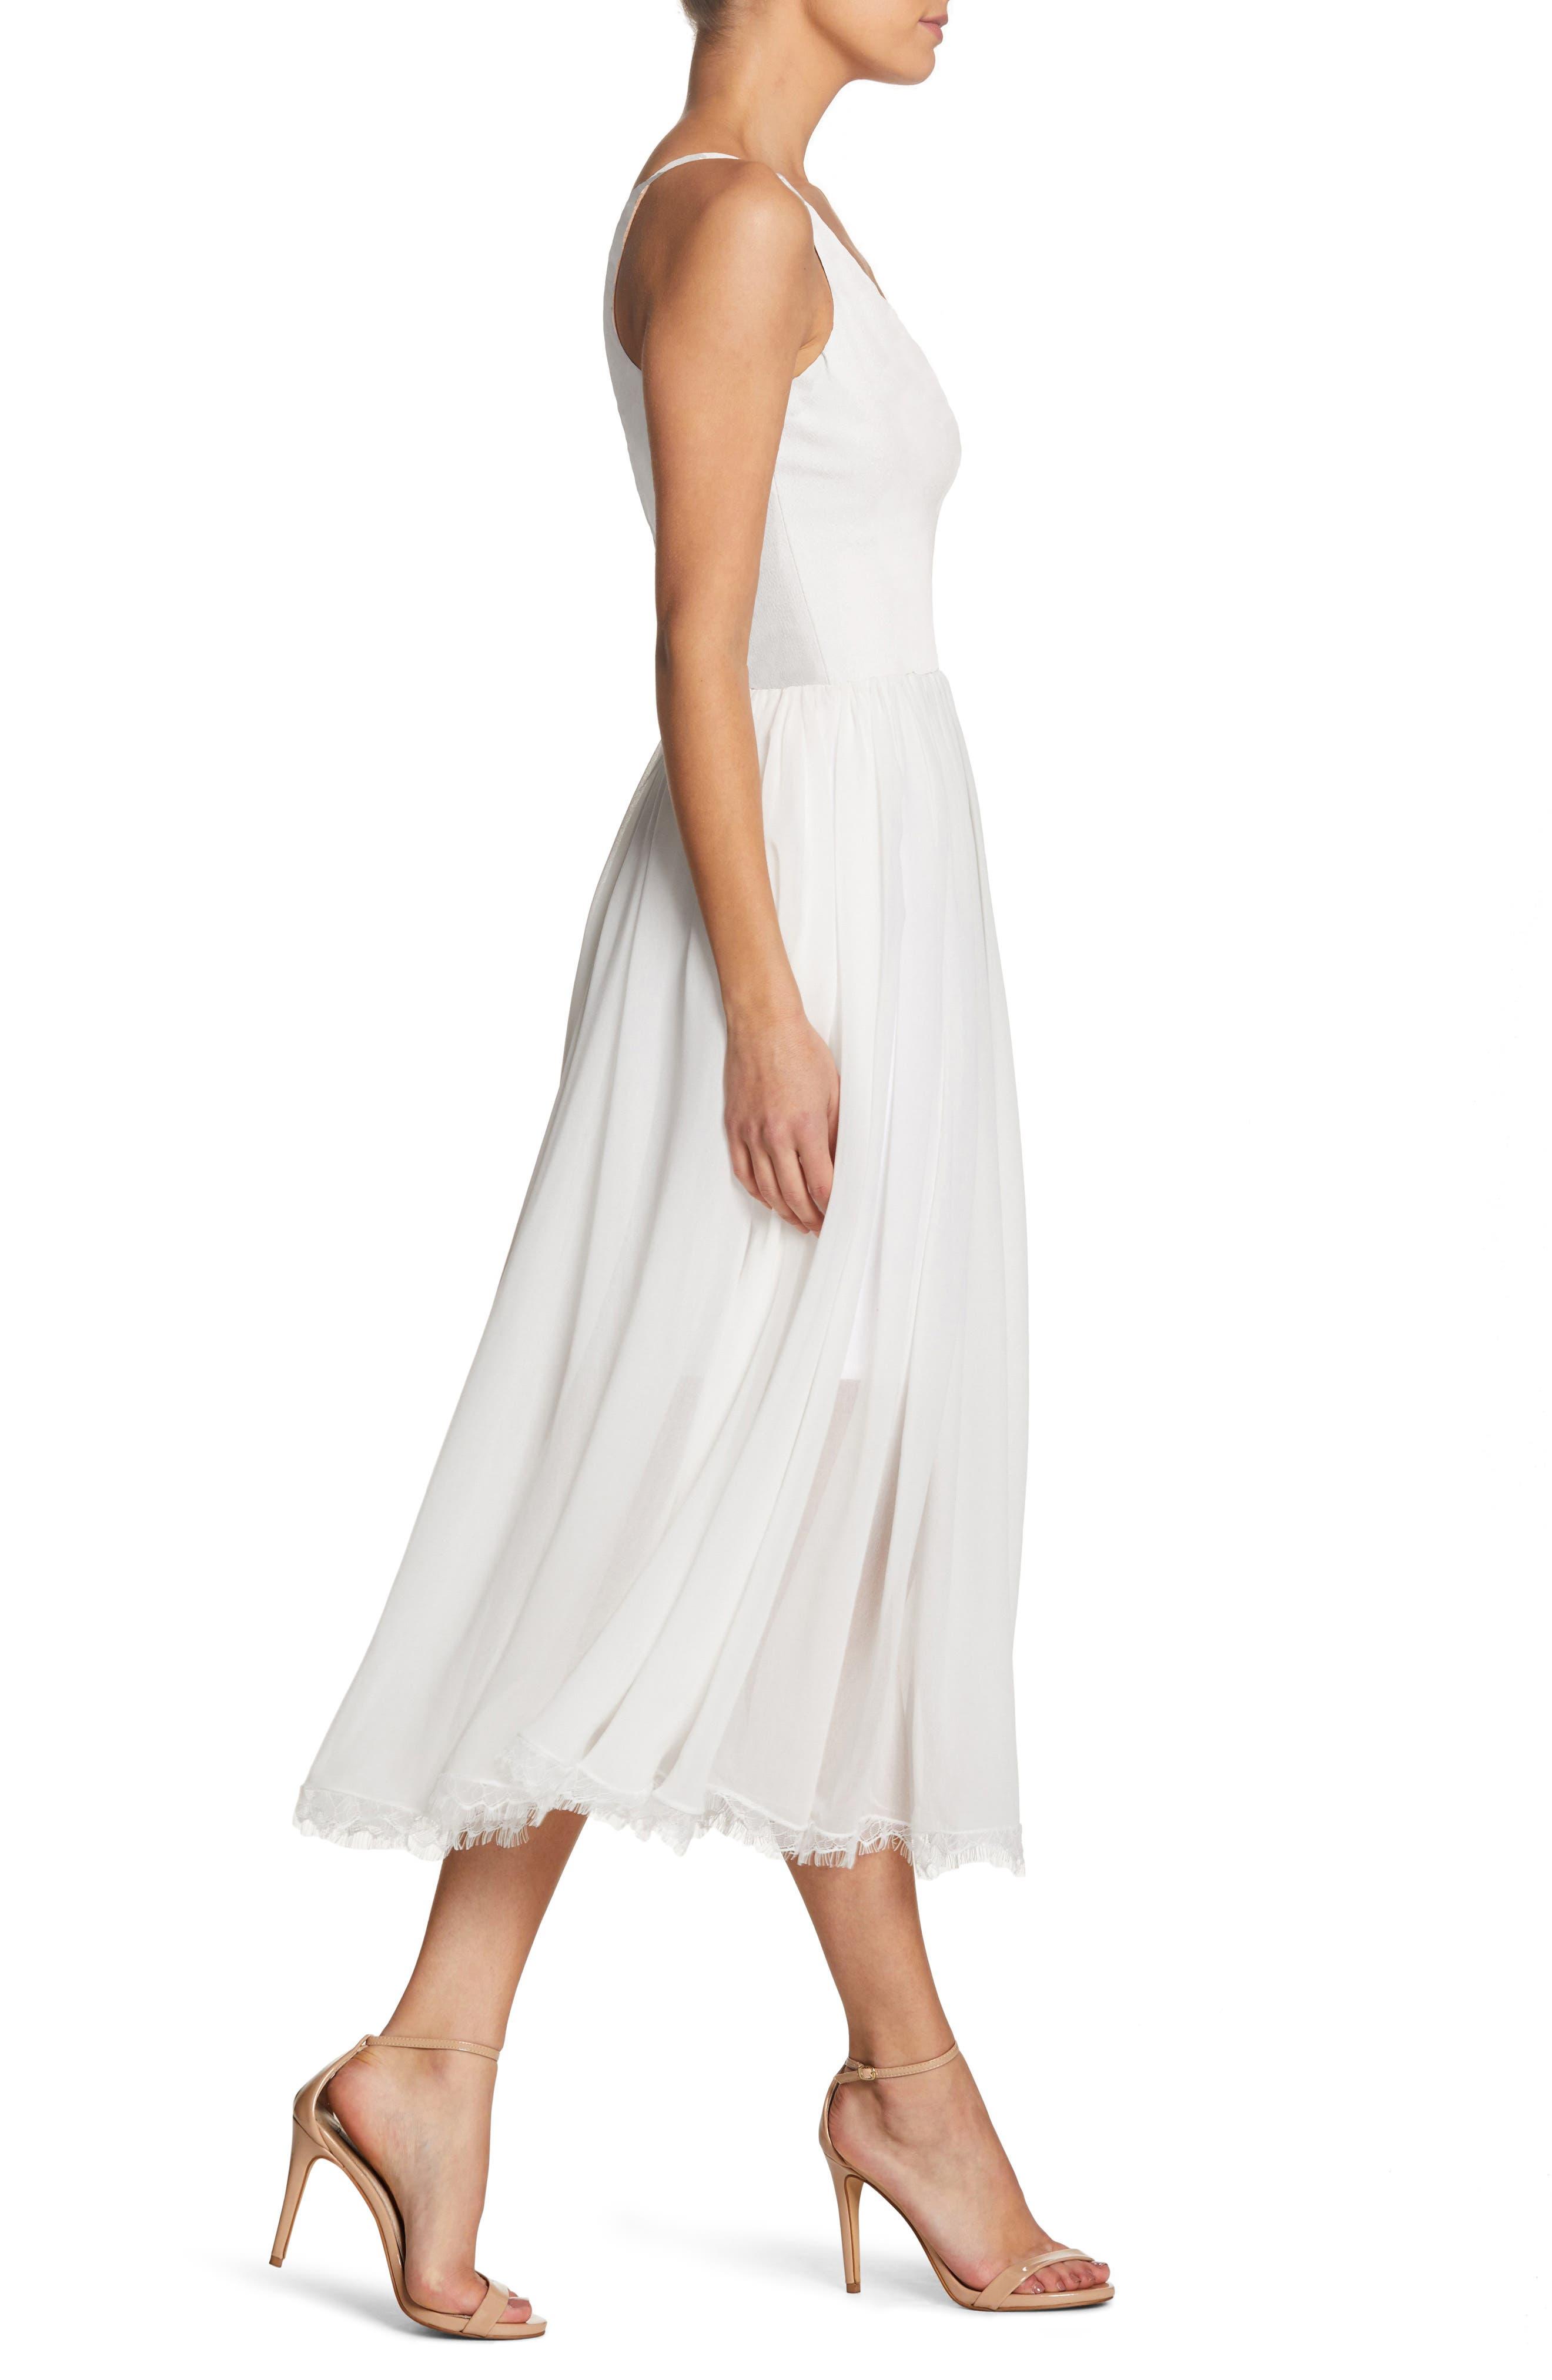 Alicia Mixed Media Midi Dress,                             Alternate thumbnail 3, color,                             OFF WHITE